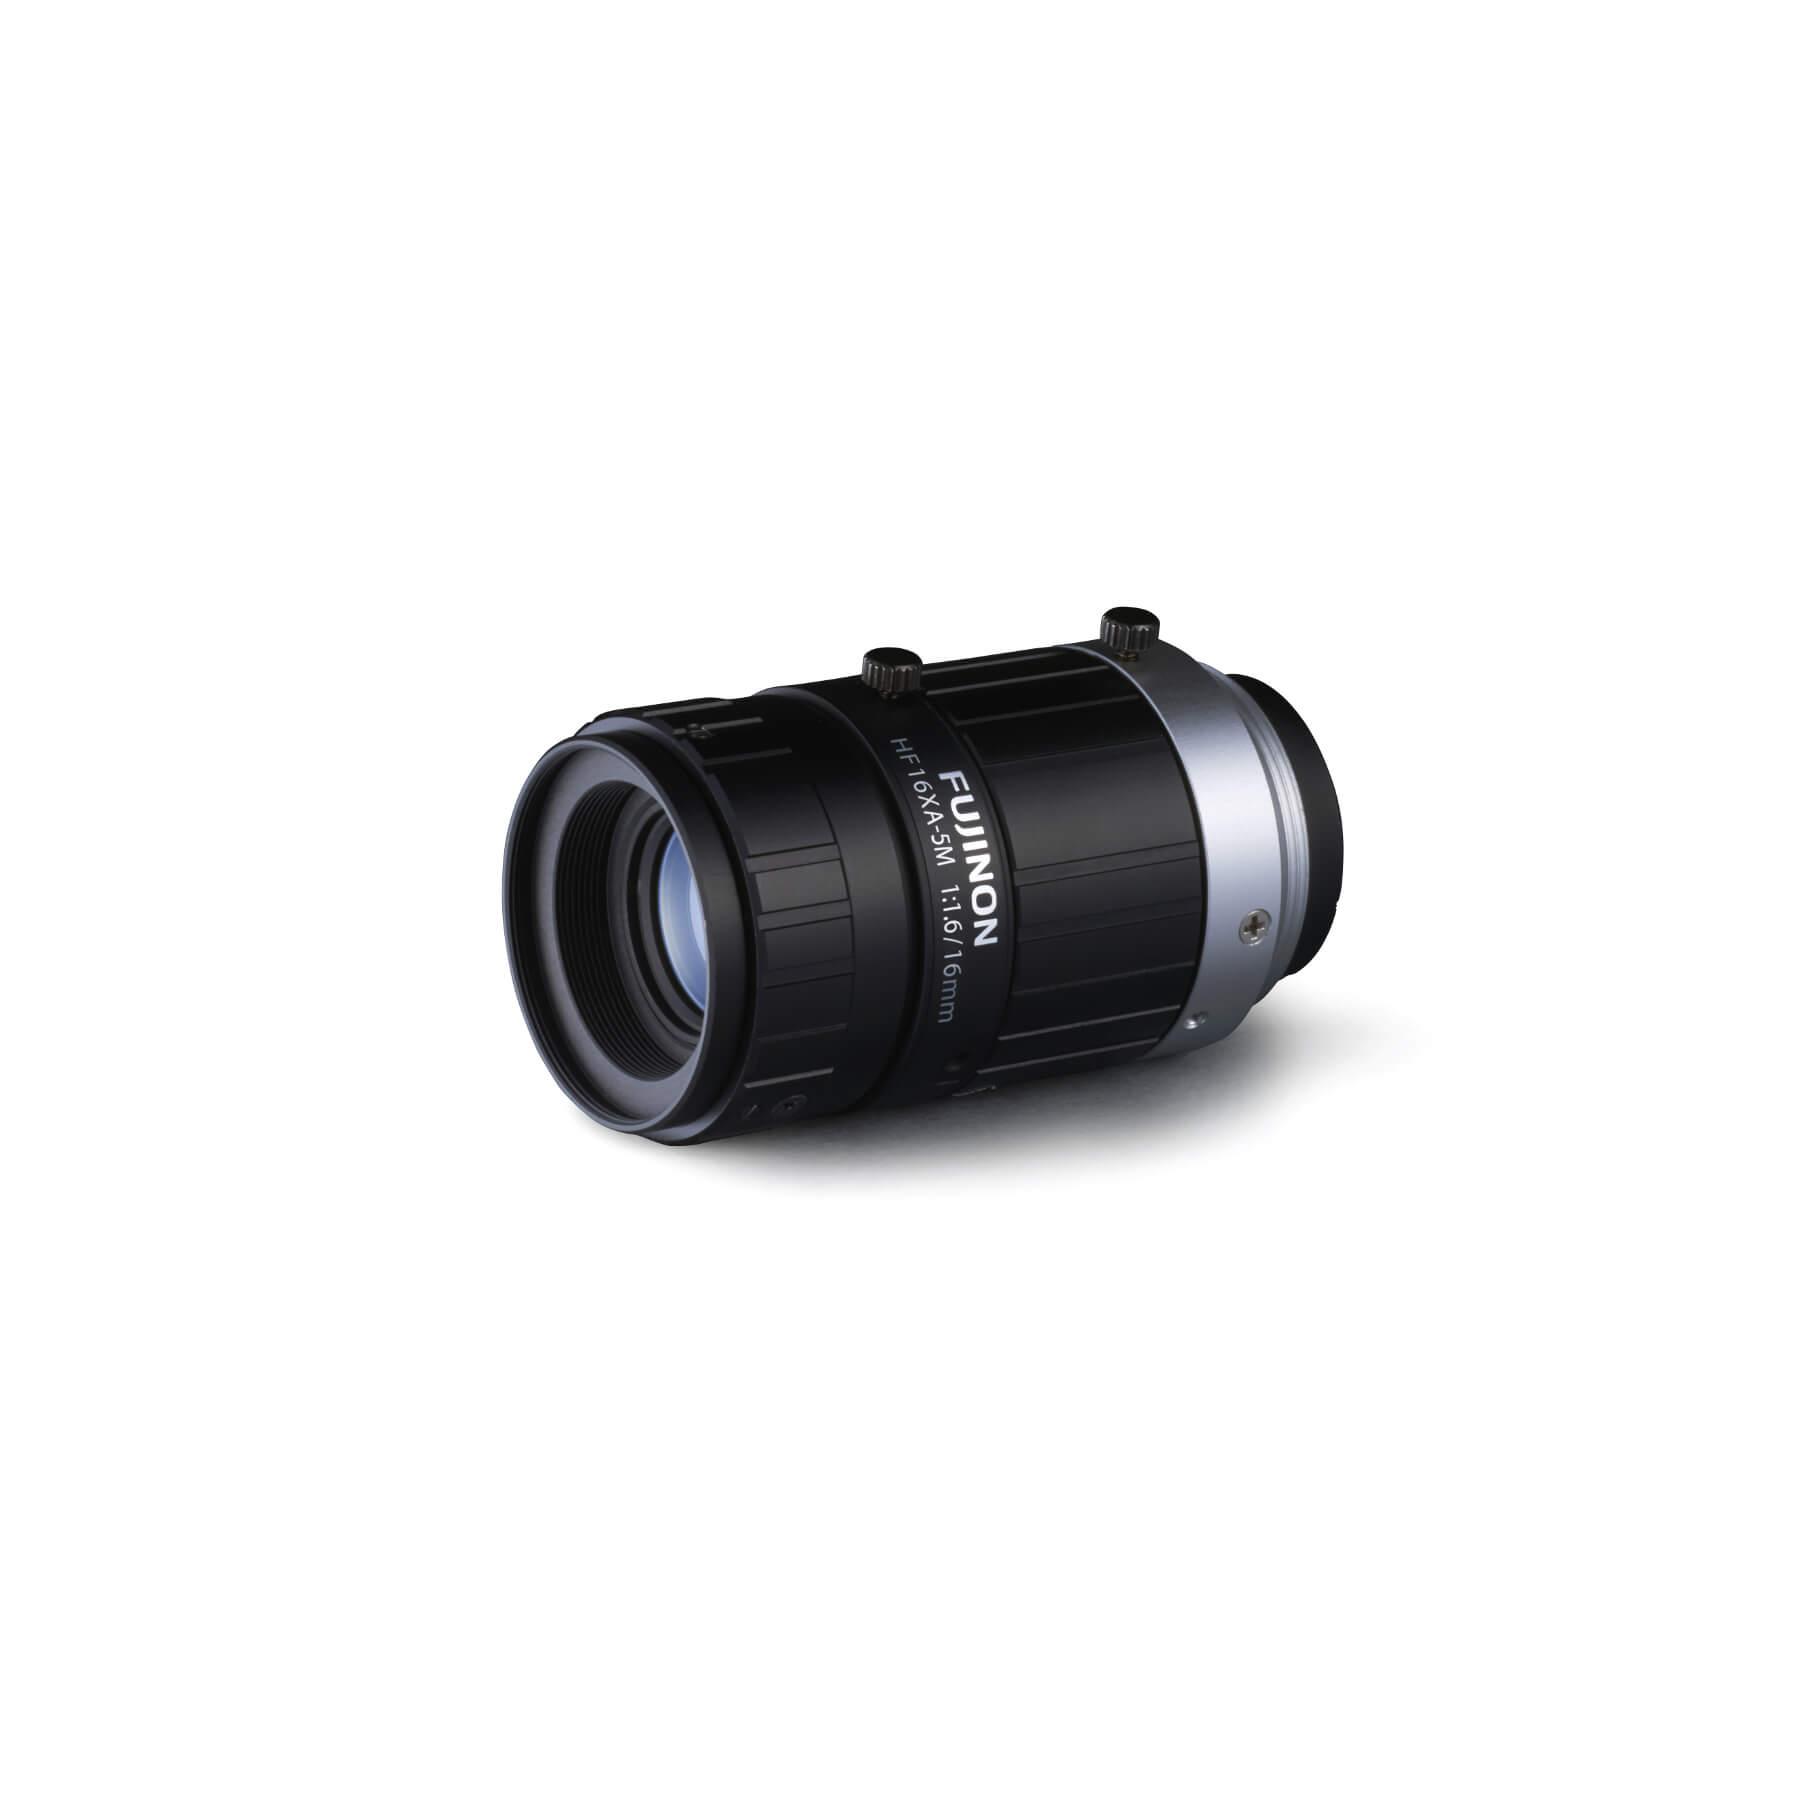 5 Megapixel HF16XA-5M